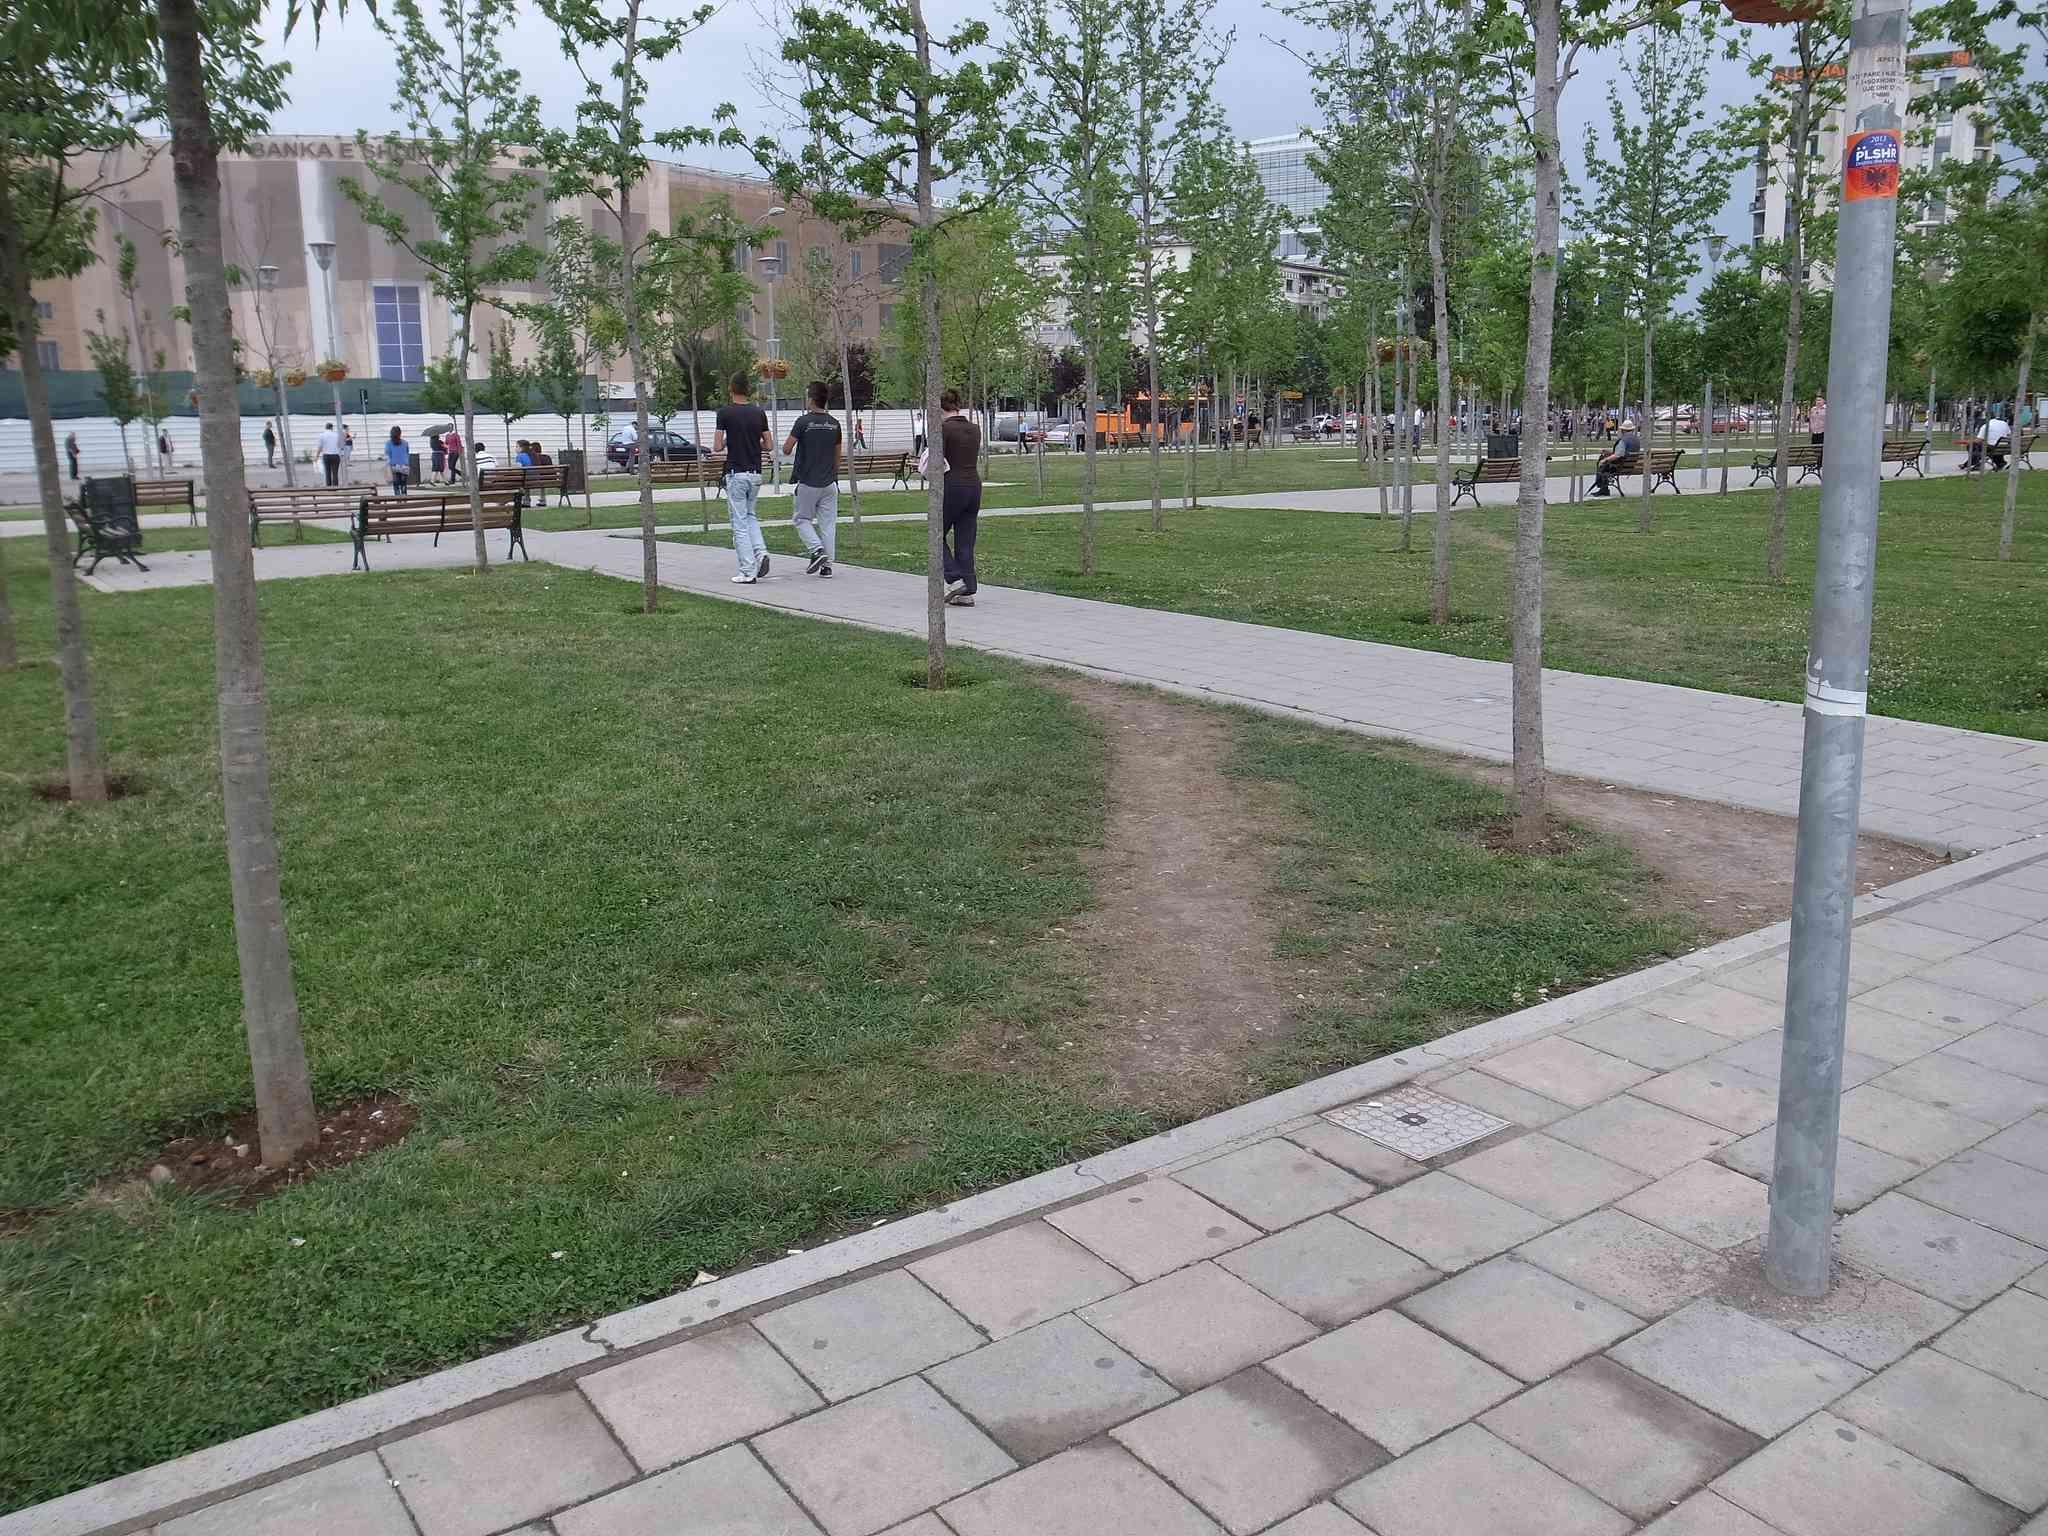 a short desire path